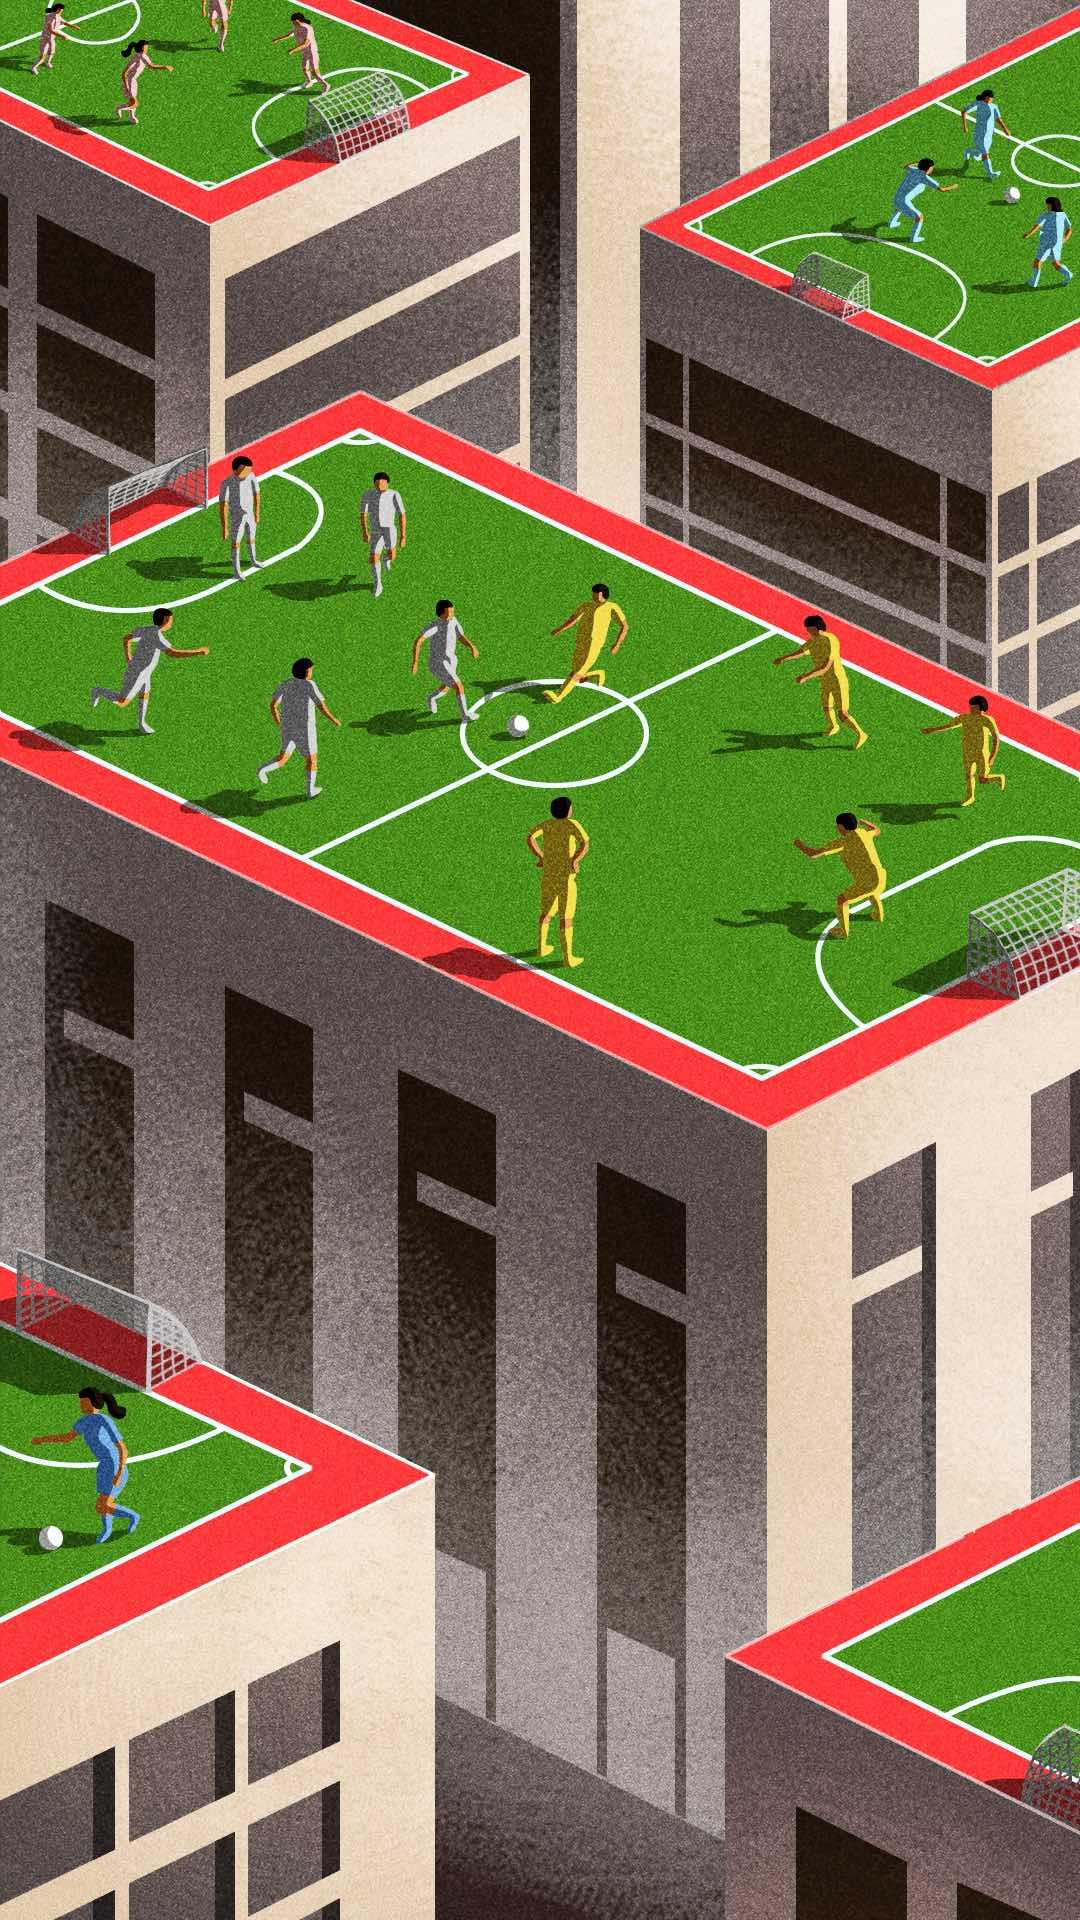 Growth of Futsal 27 Oct 18